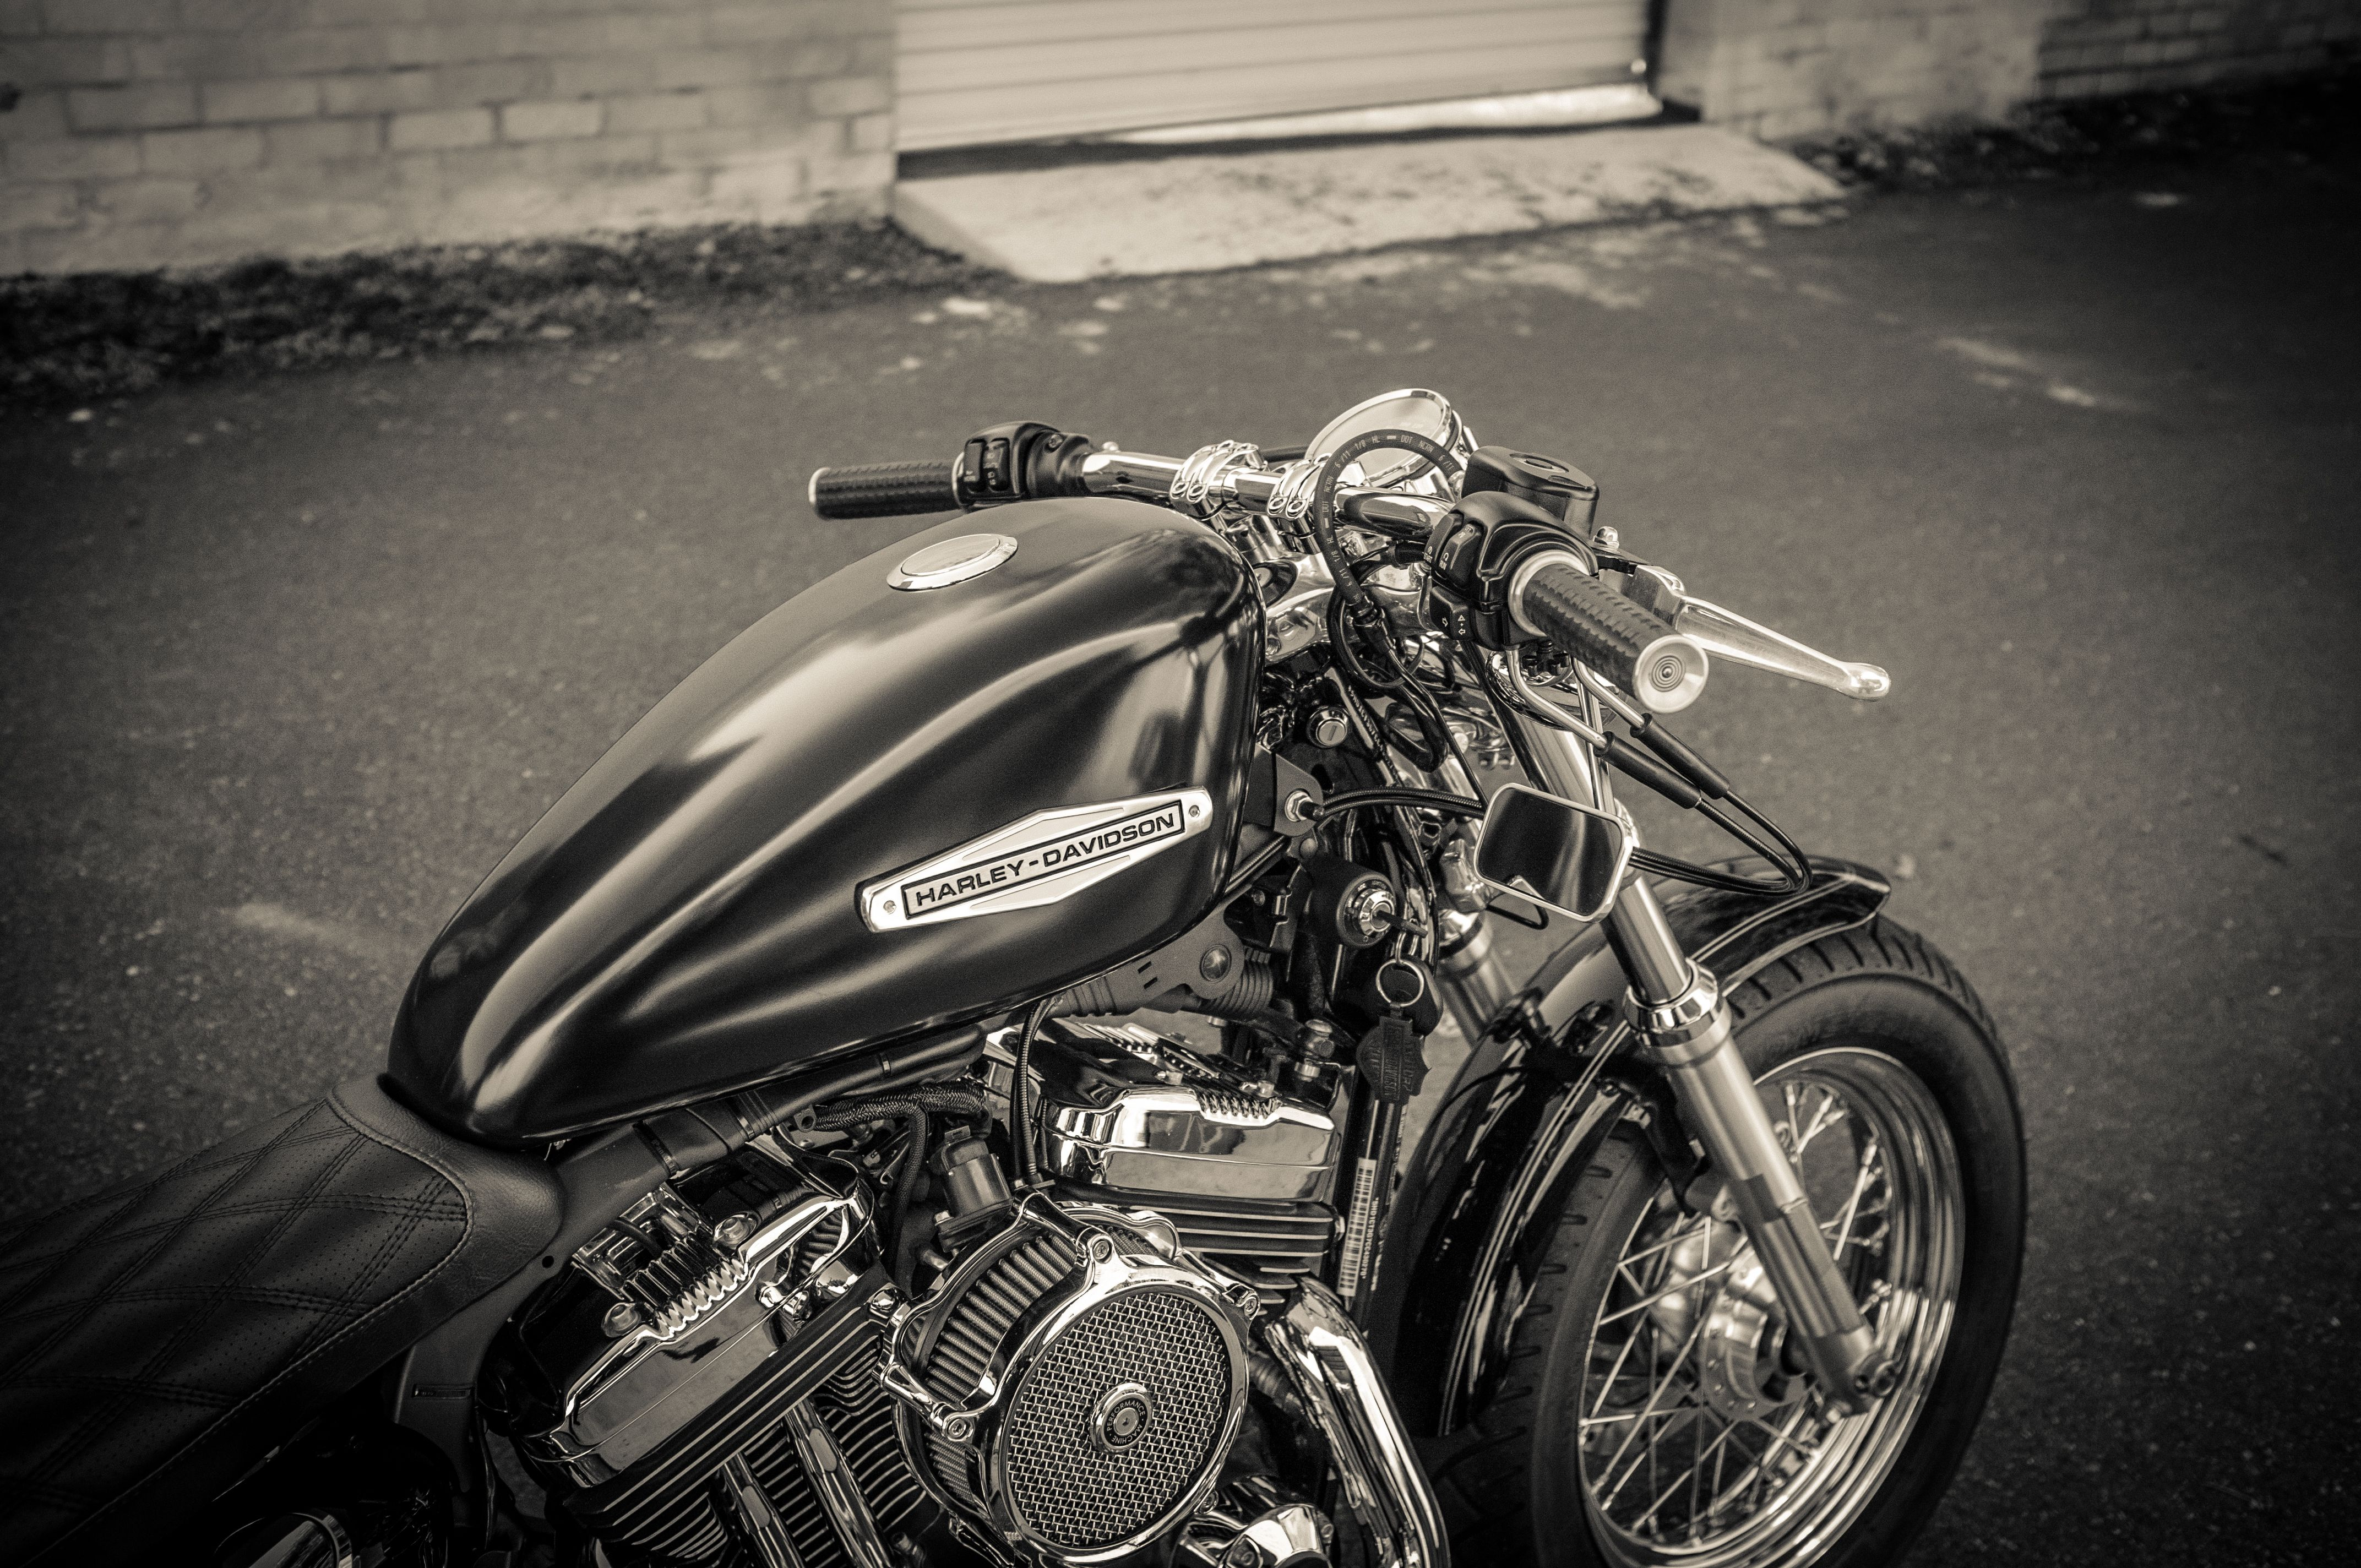 12' Harley-Davidson Sportster XL1200C - Build 14' - Part 2. 66' - 71' OEM Gas Tank Emblems.